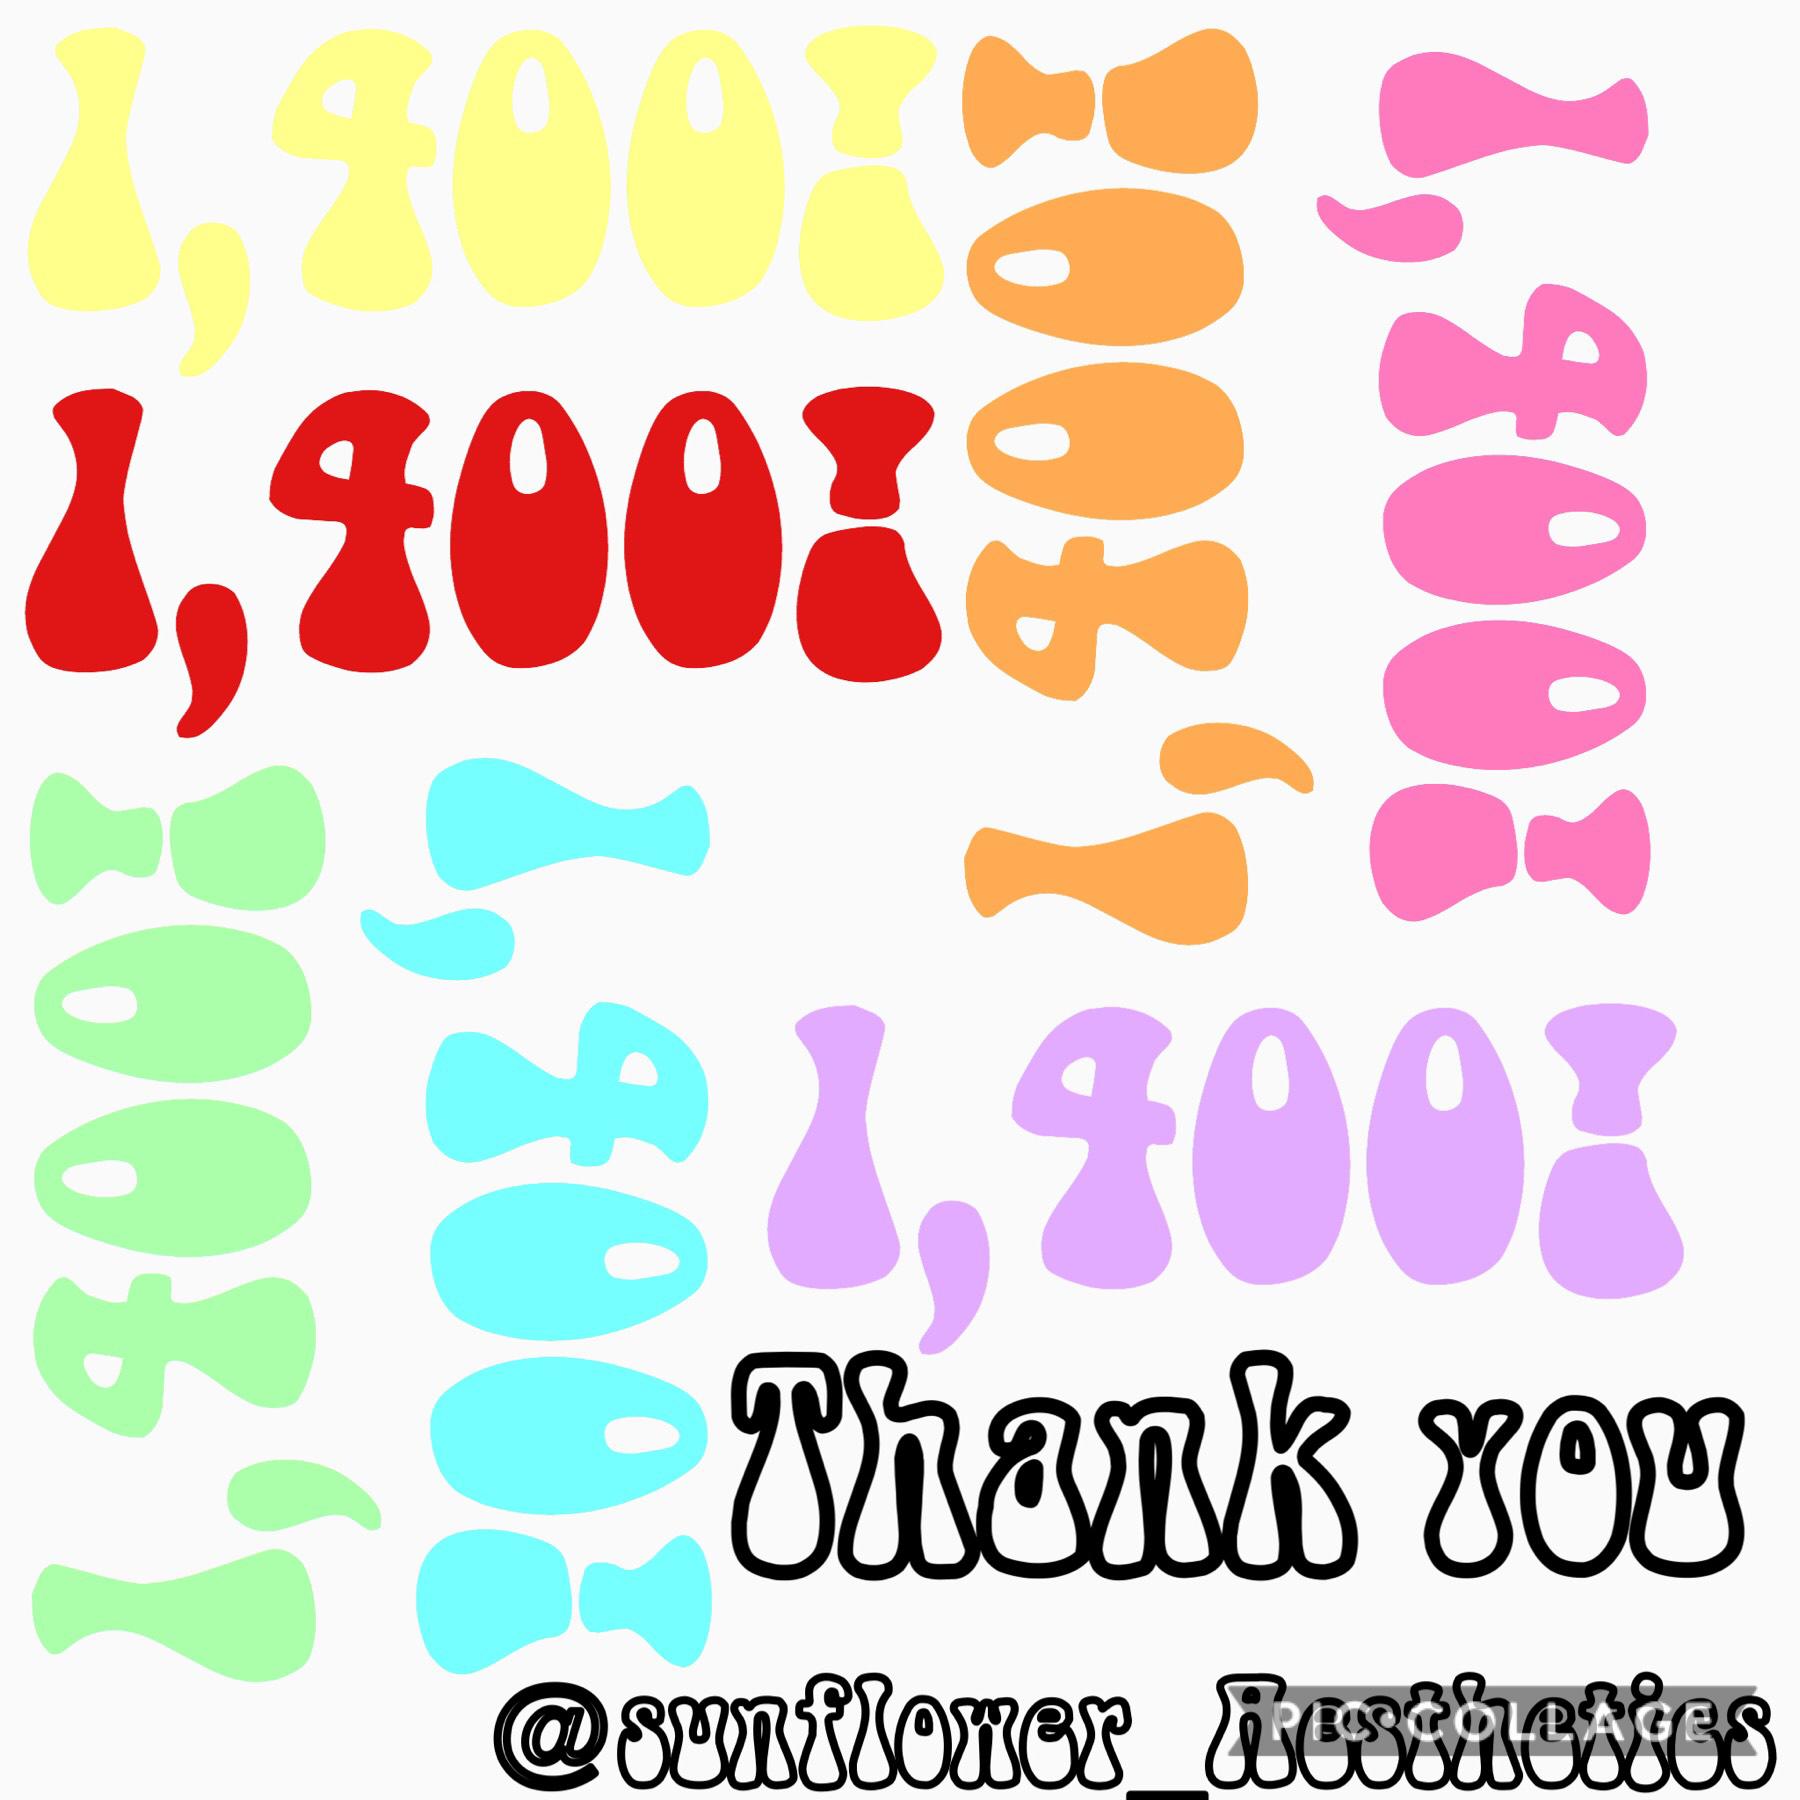 1,400 followers YAY 🥳